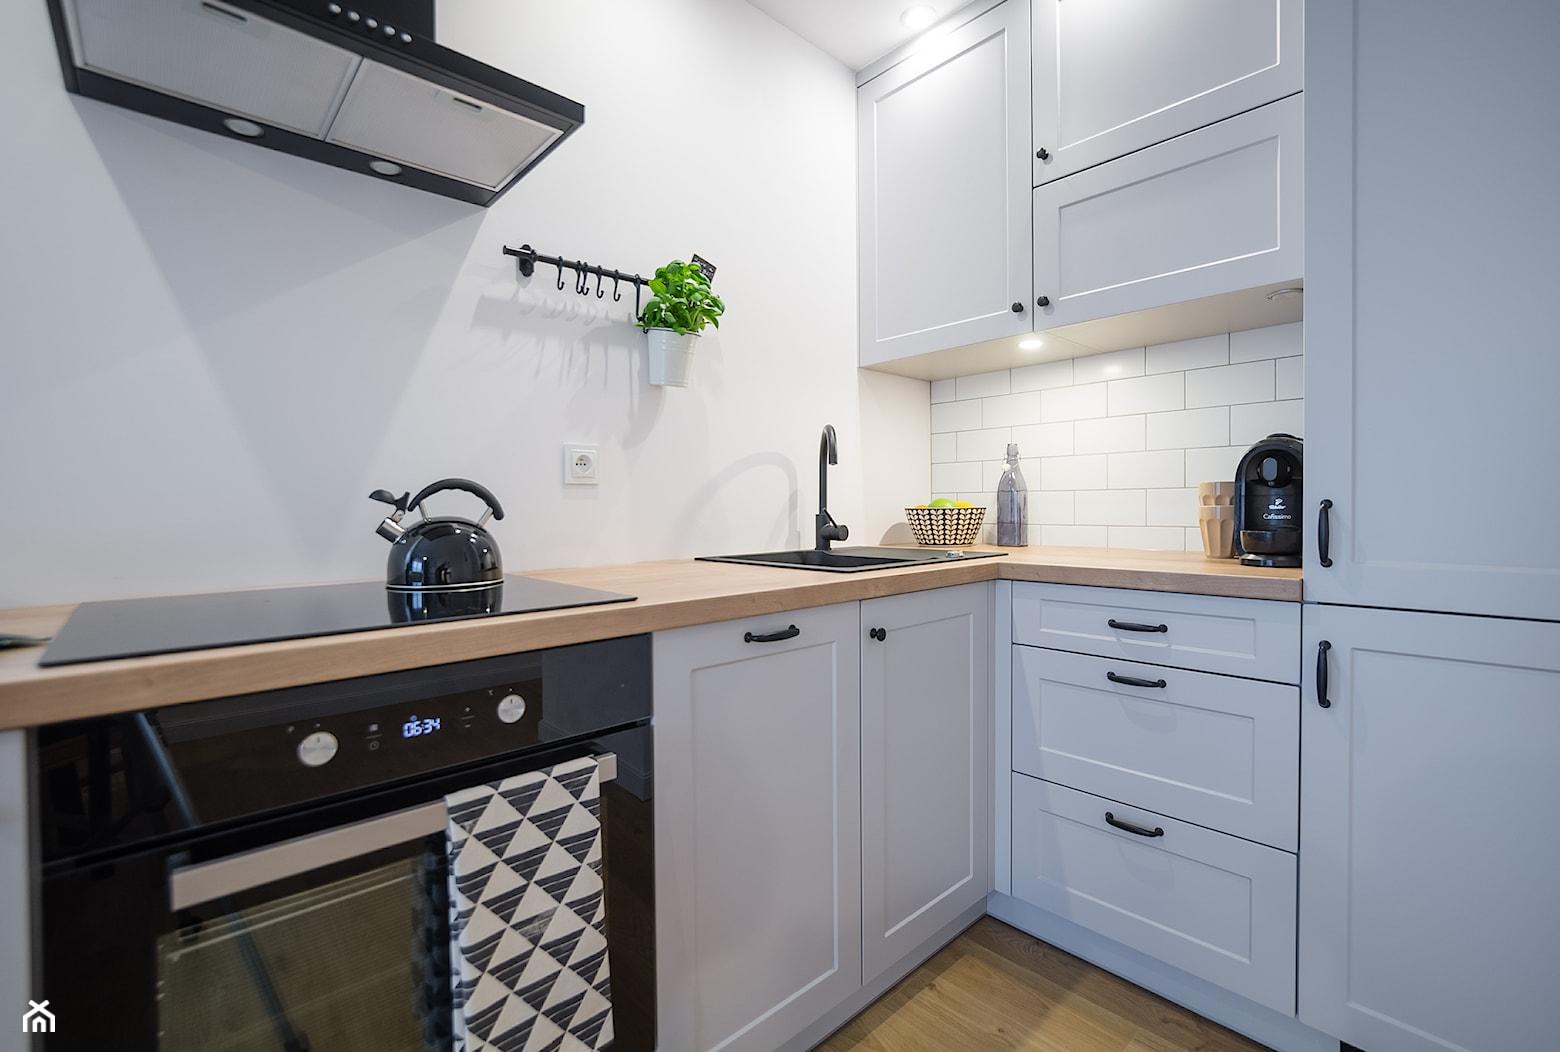 Szara kuchnia - zdjęcie od MOA design - Homebook